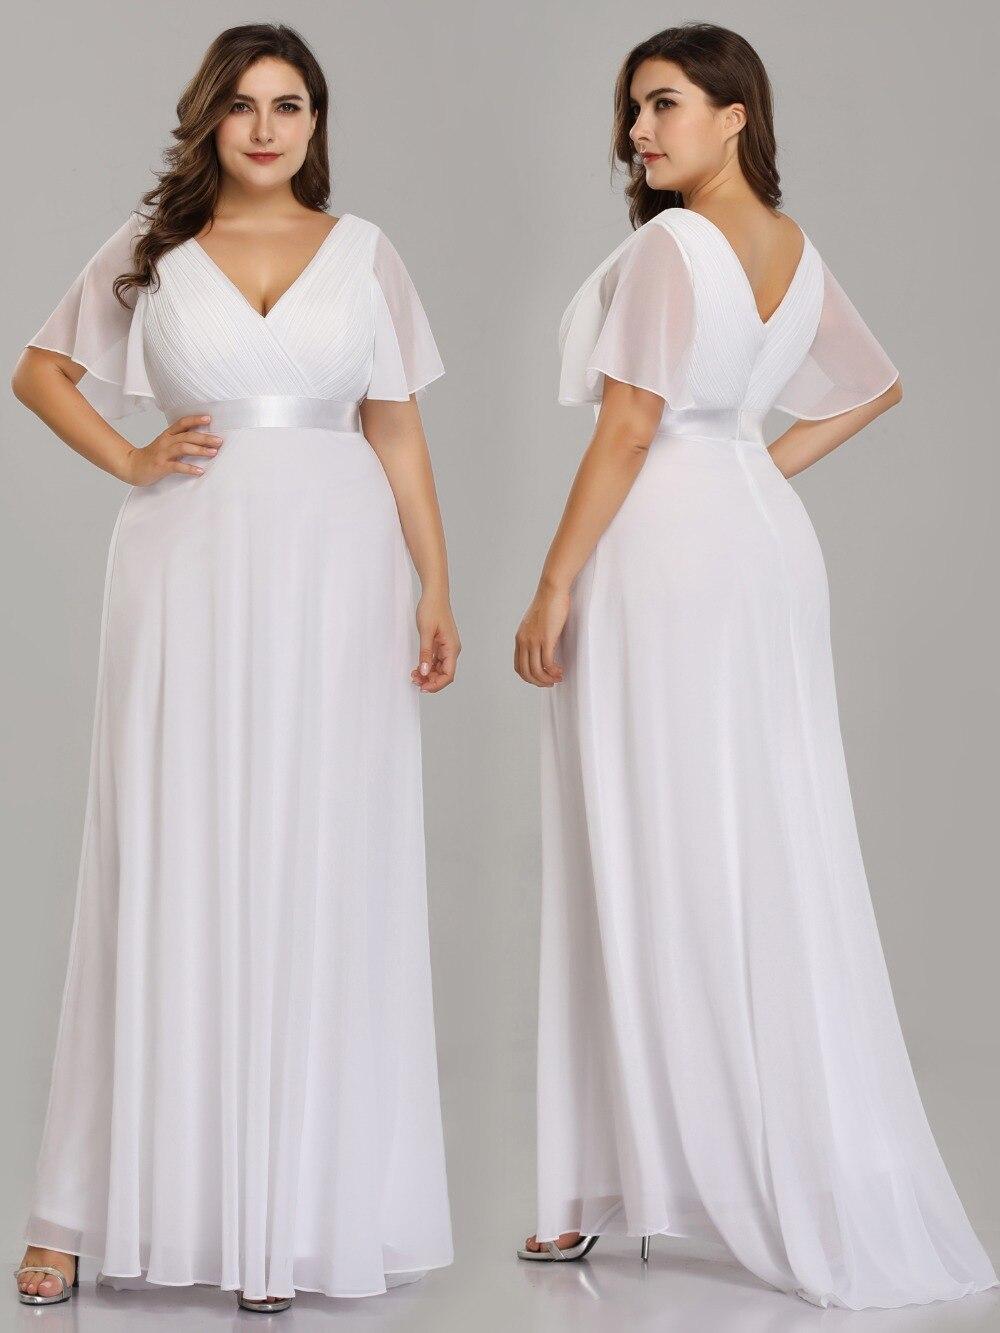 Image 5 - Plus Size Wedding Dress 2019 Ever Pretty Beach Simple A line Chiffon White Robe De Mariee Elegant V neck Vestido De Noiva-in Wedding Dresses from Weddings & Events